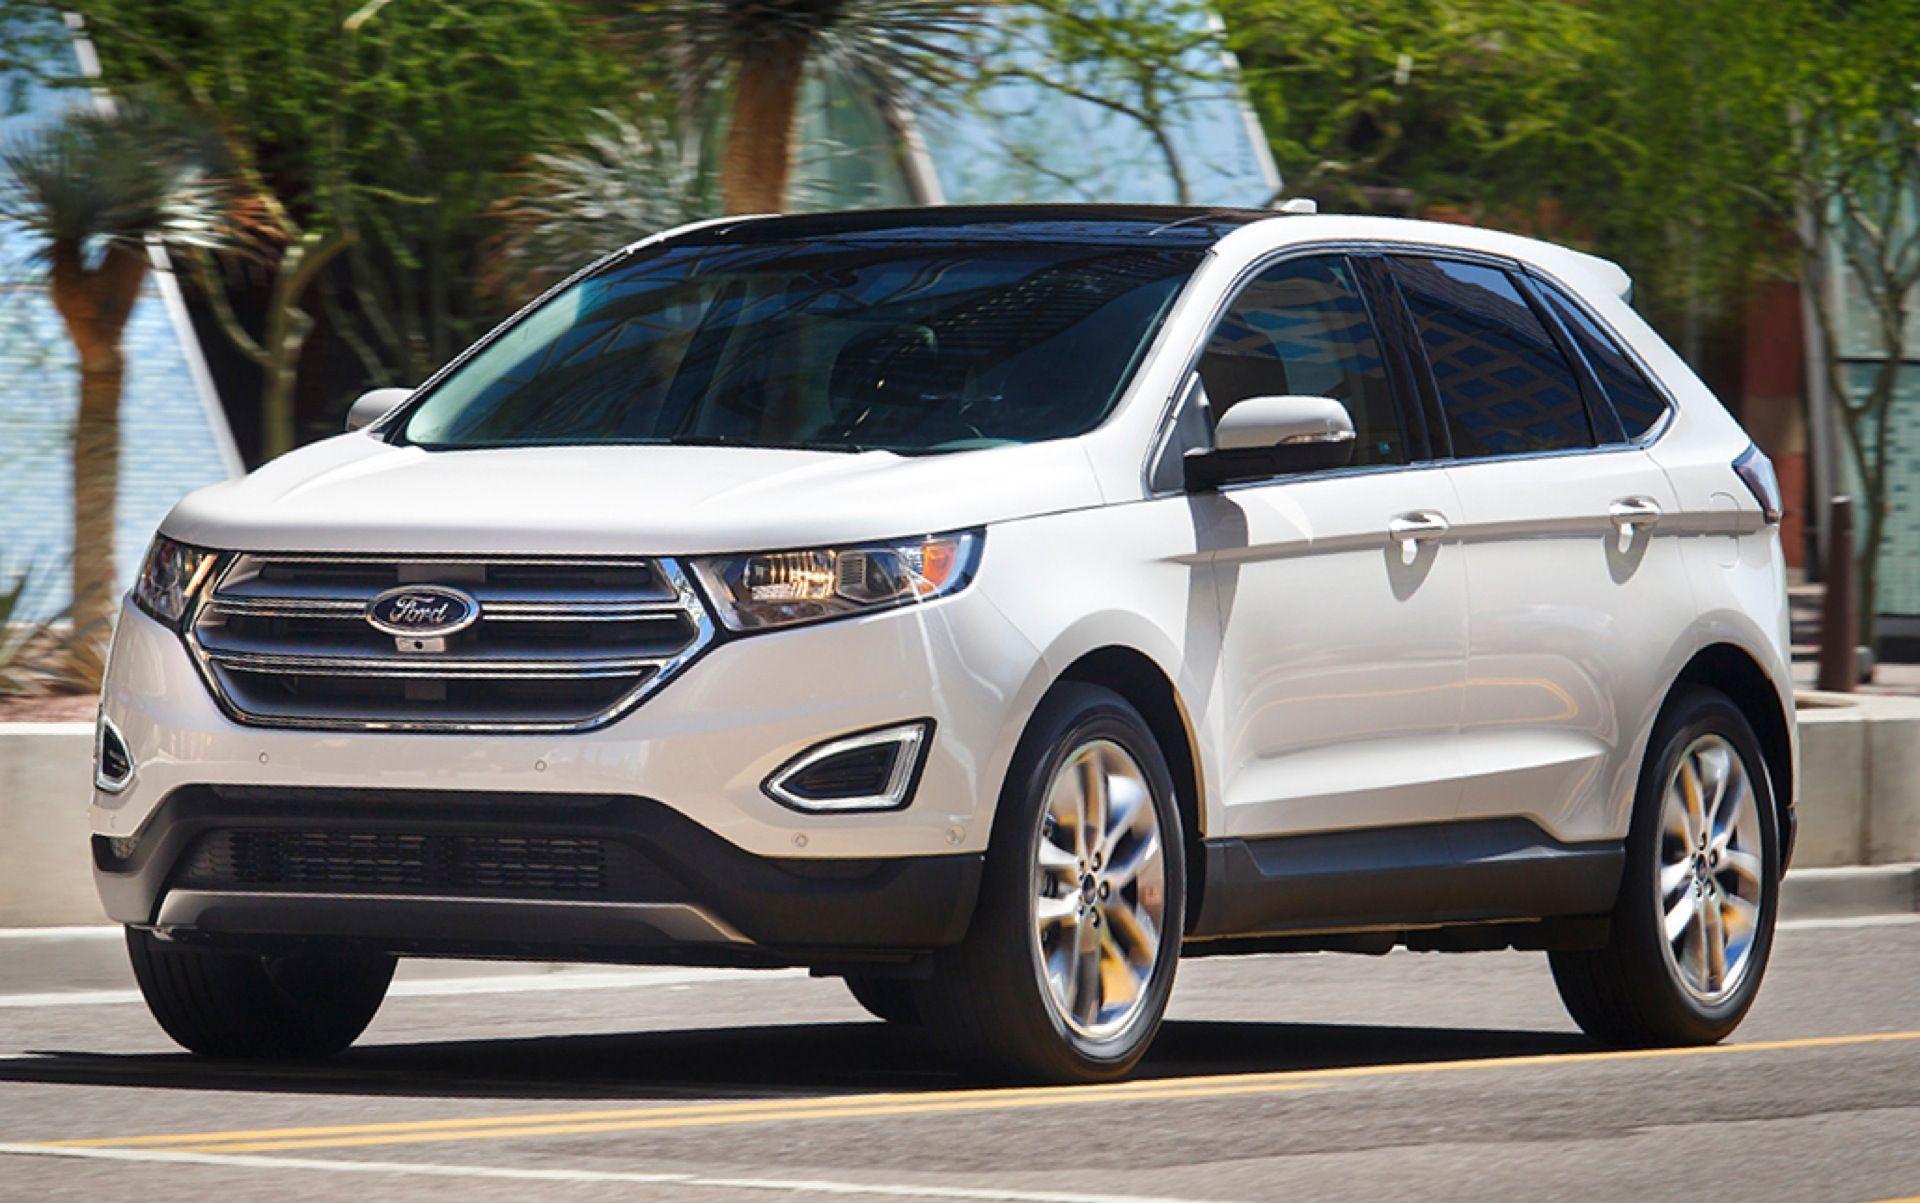 2015 Ford Edge Ford Edge 2016 Ford Edge Ford Suv